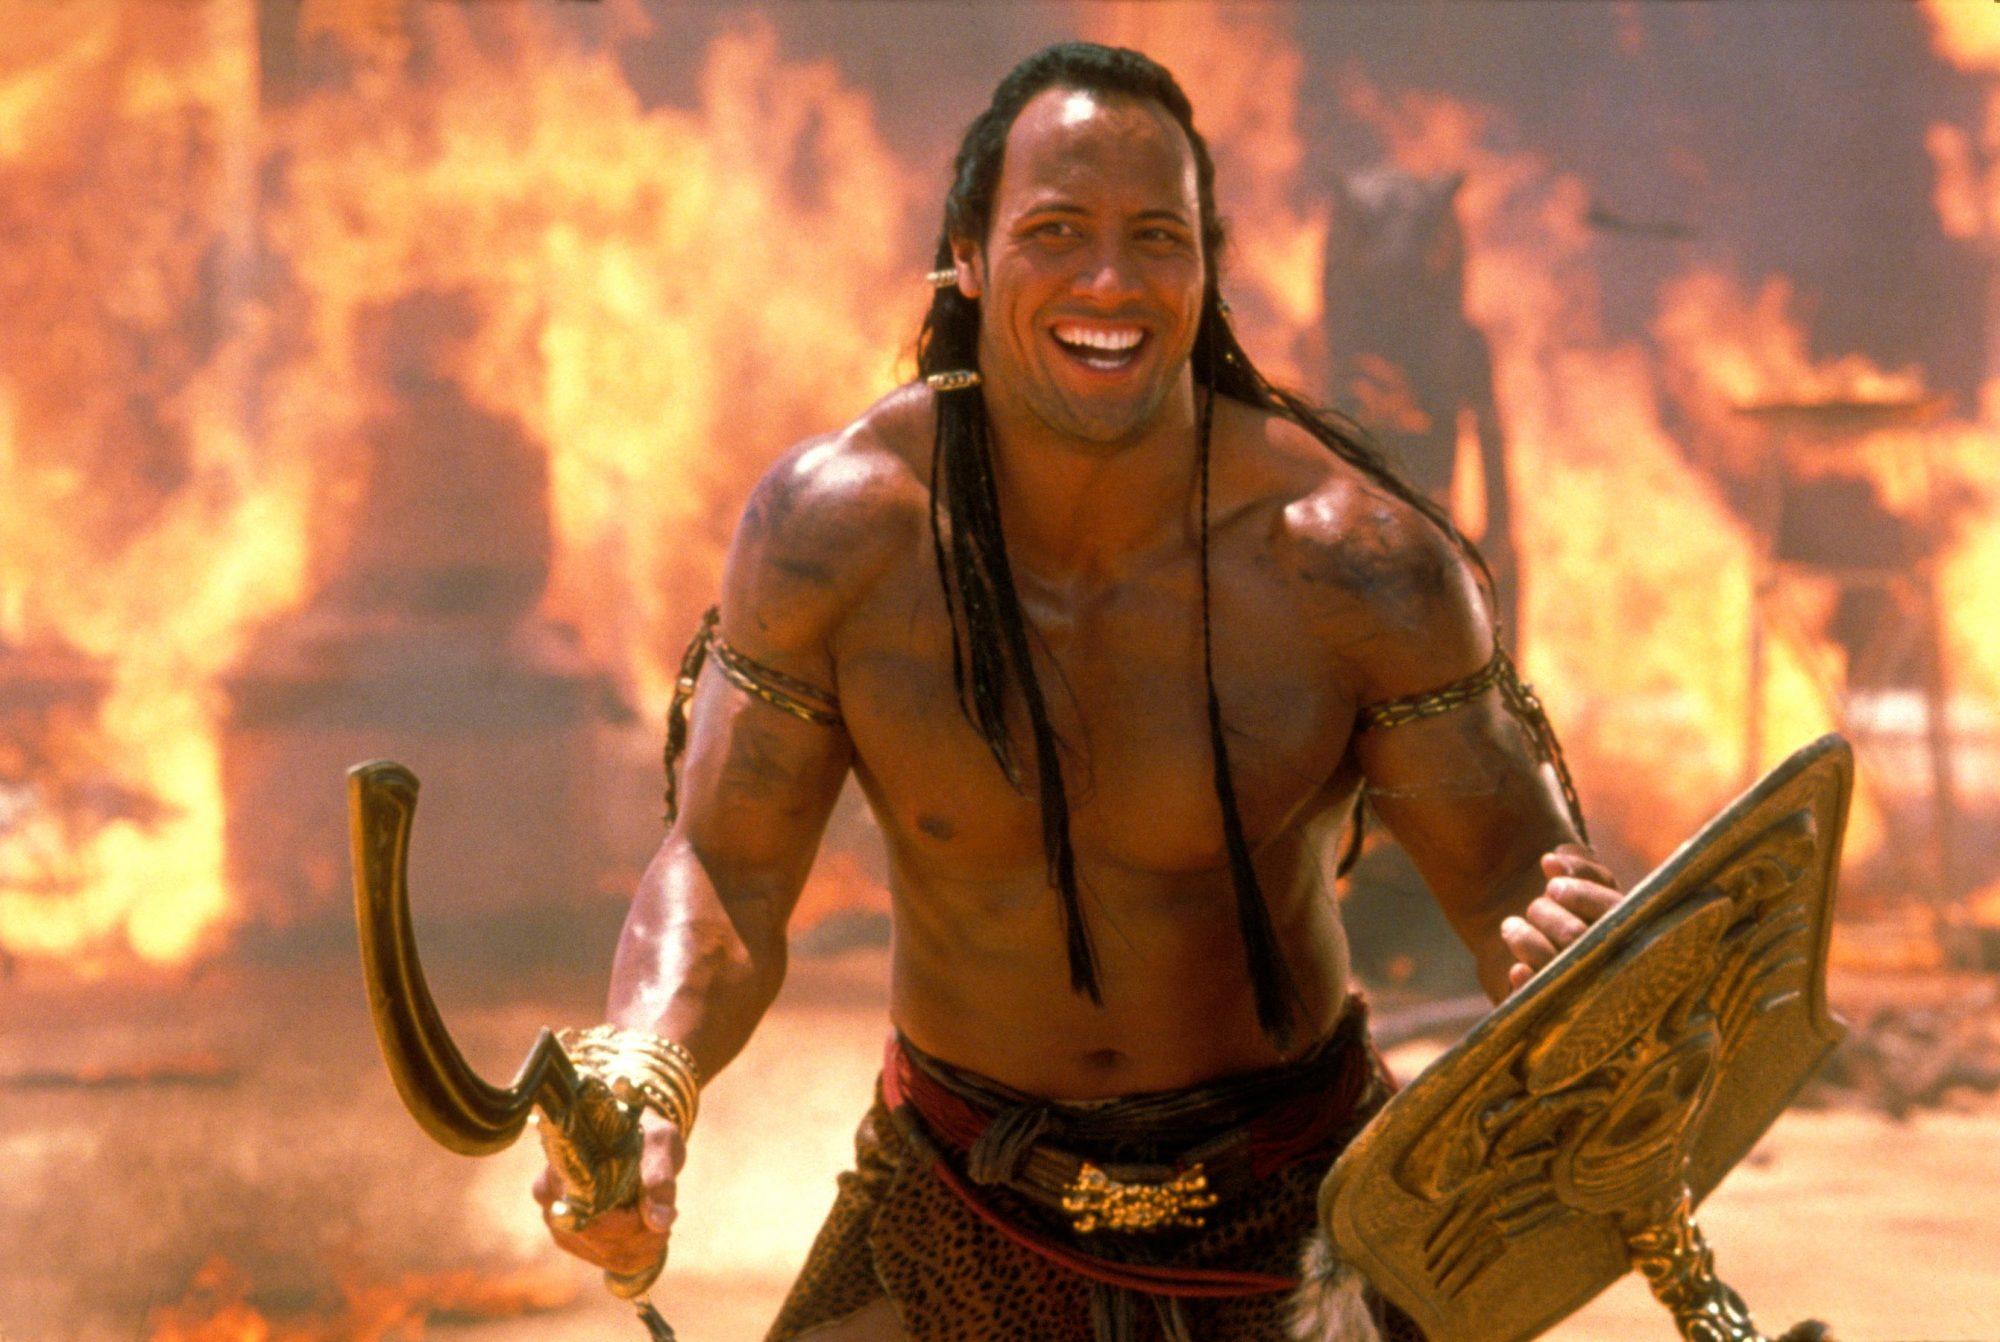 Dwayne Johnson was seriously ill when he shot The Mummy Returns | EW.com